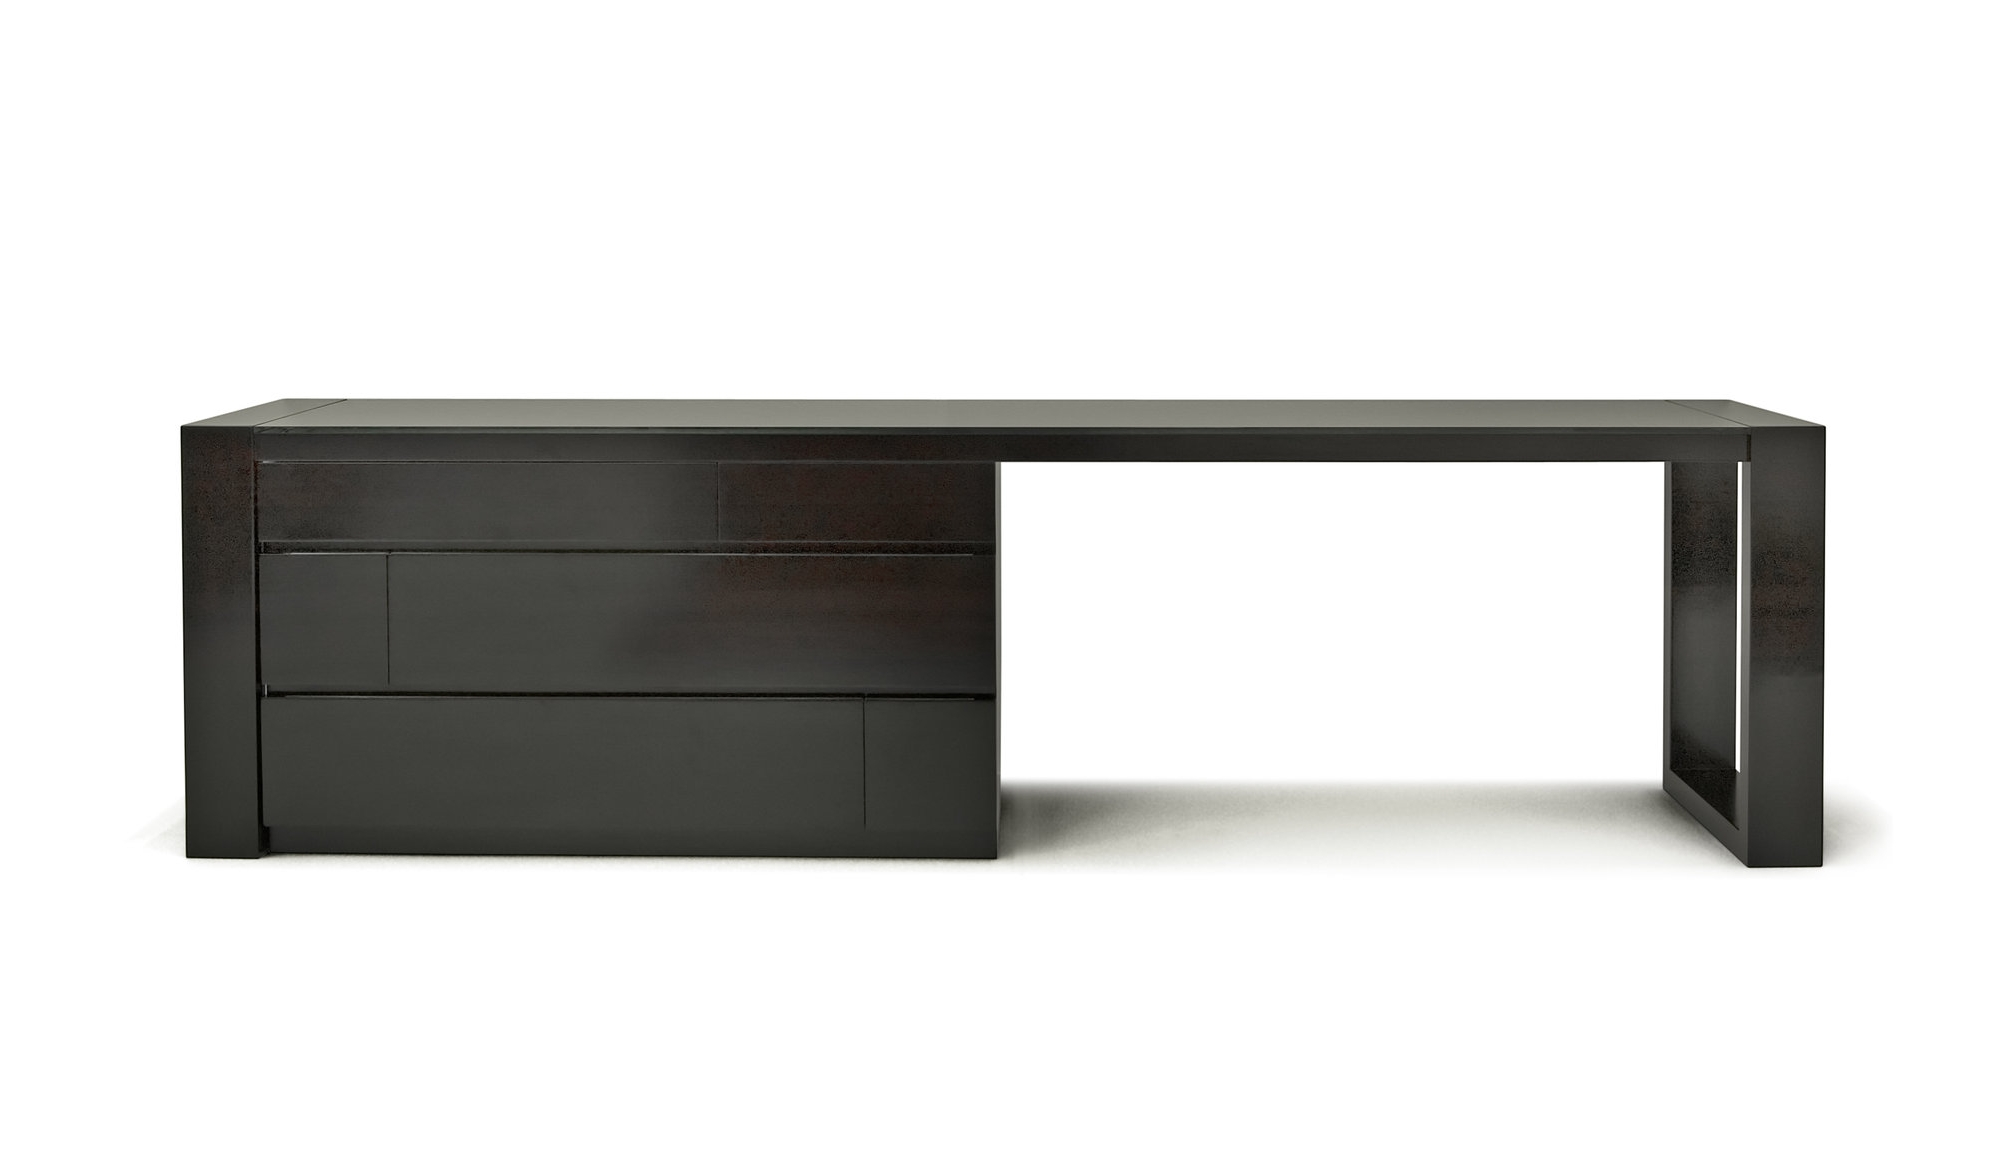 ....Custom made Modern furniture : Cabinet table..特别定制現代家具:柜台....